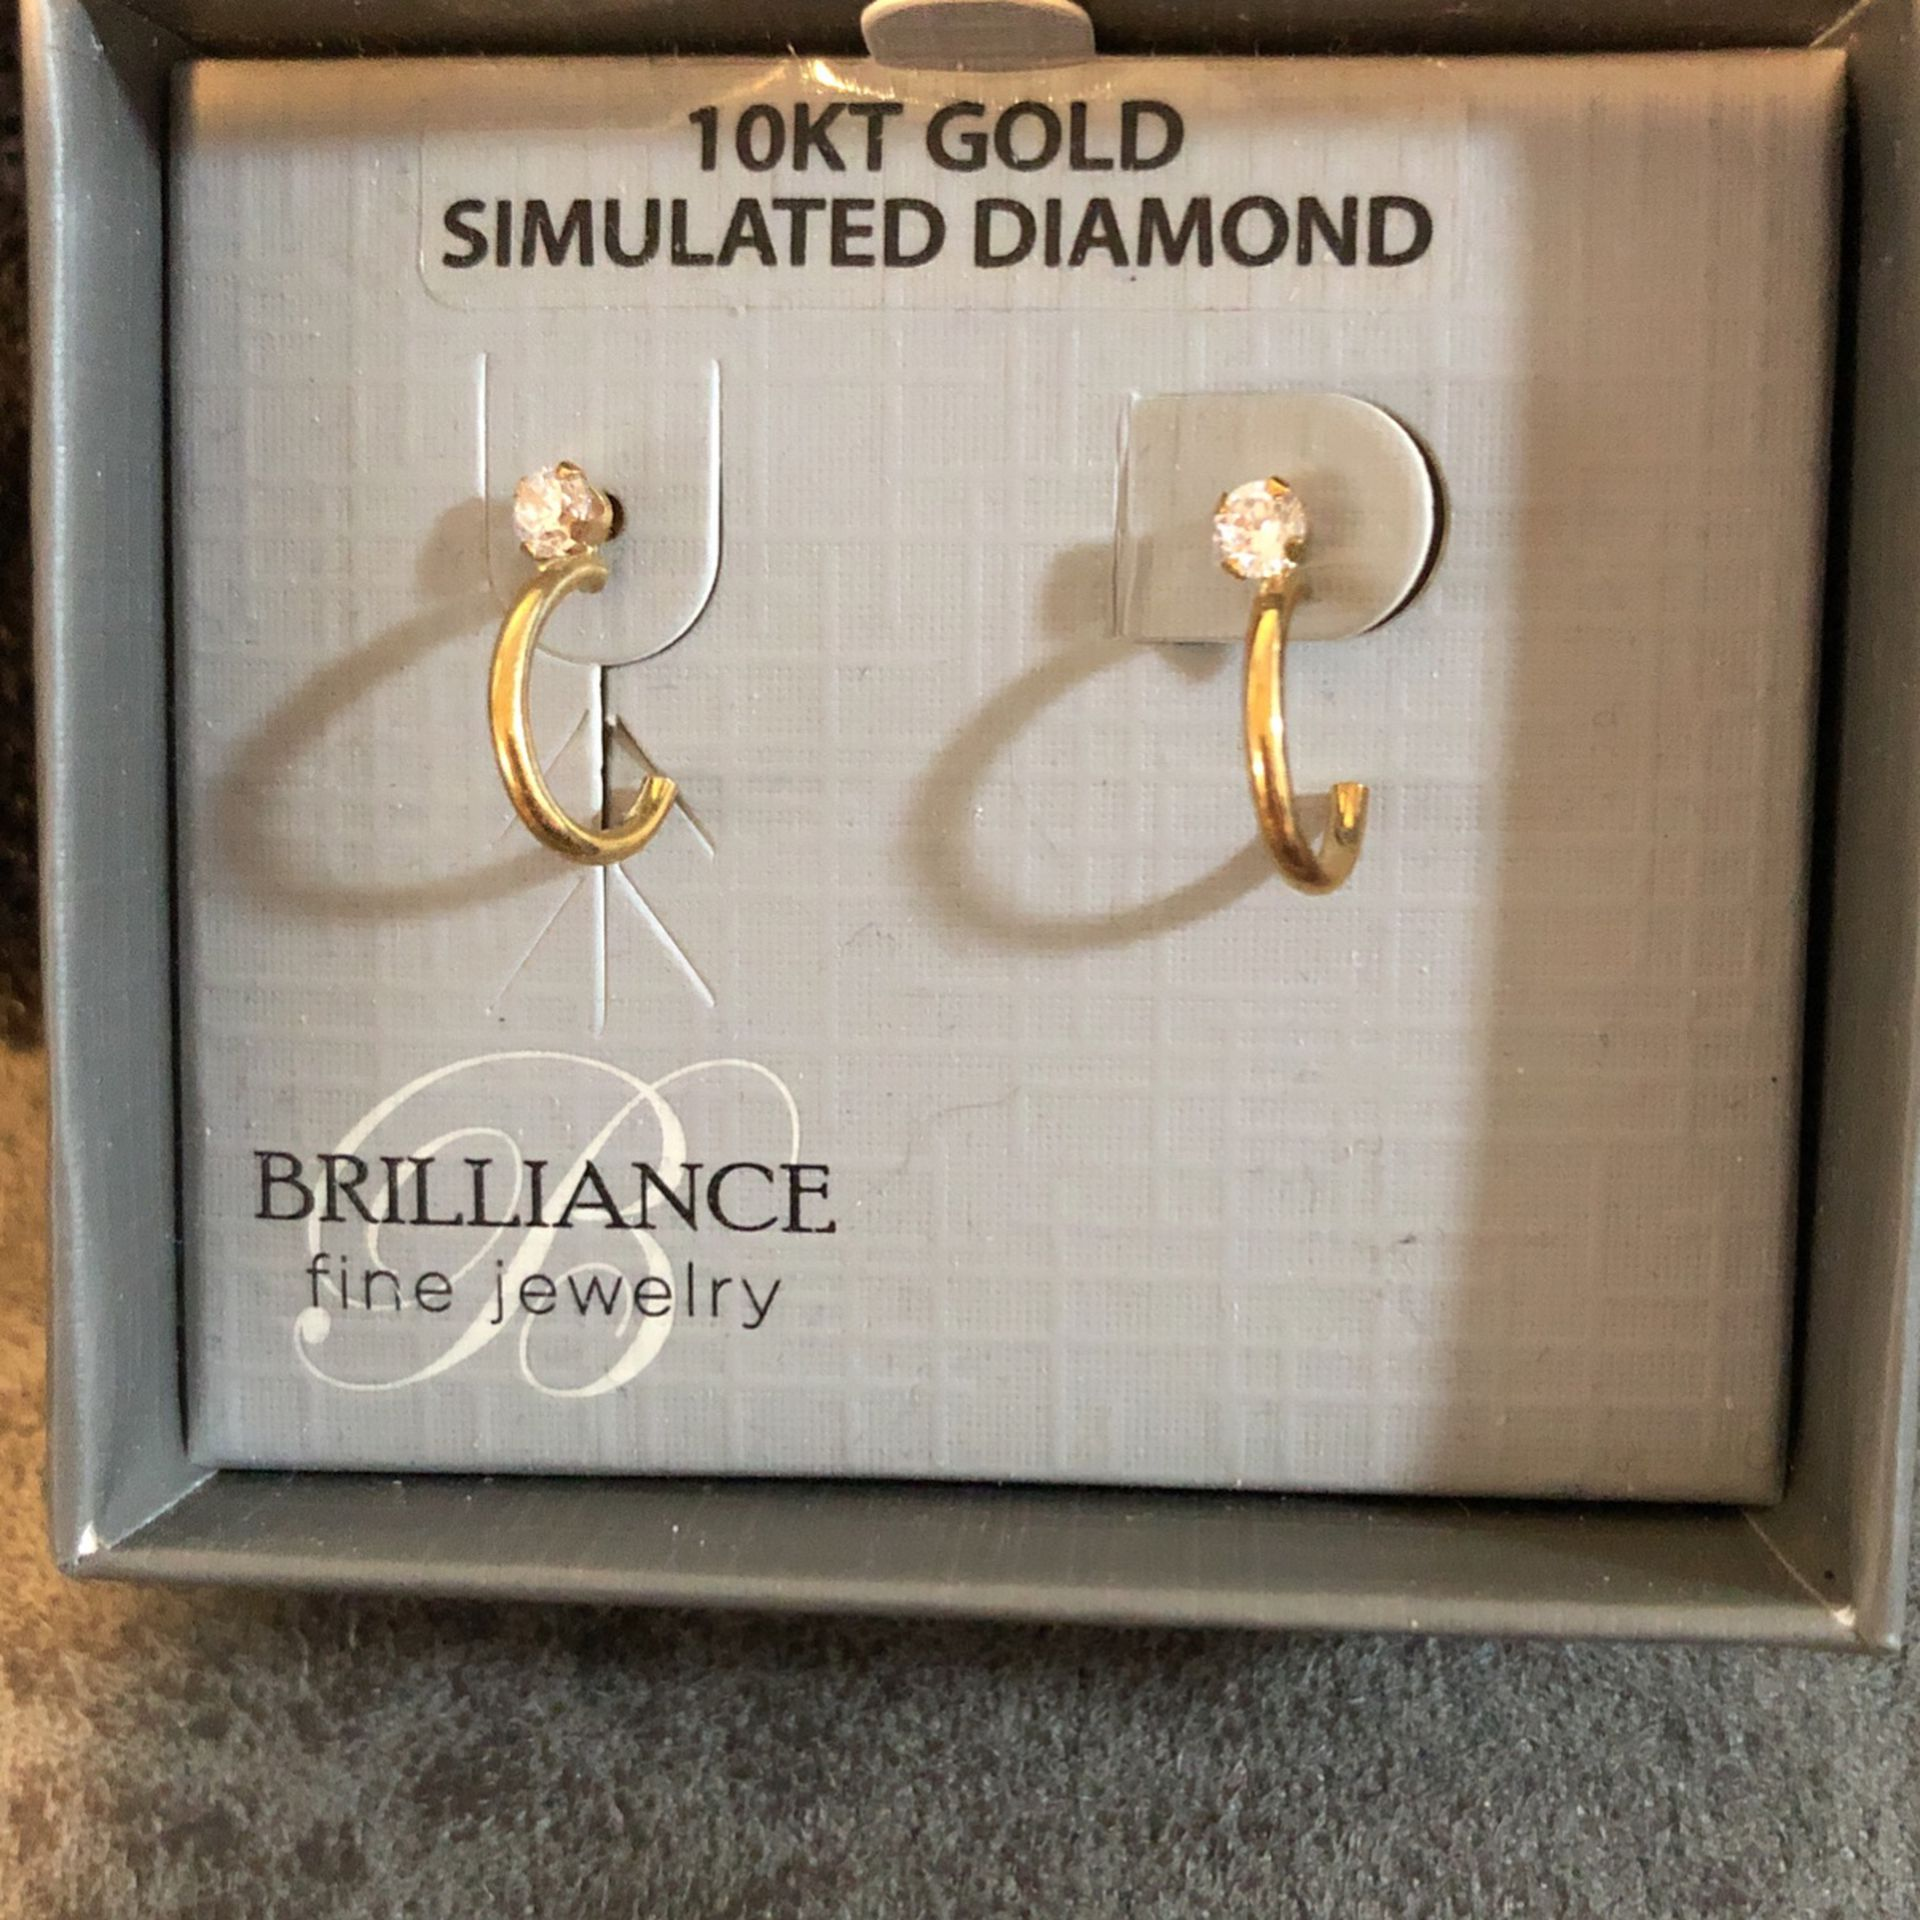 10 KT SIMULATED DIAMOND 💎 GOLD EARRINGS